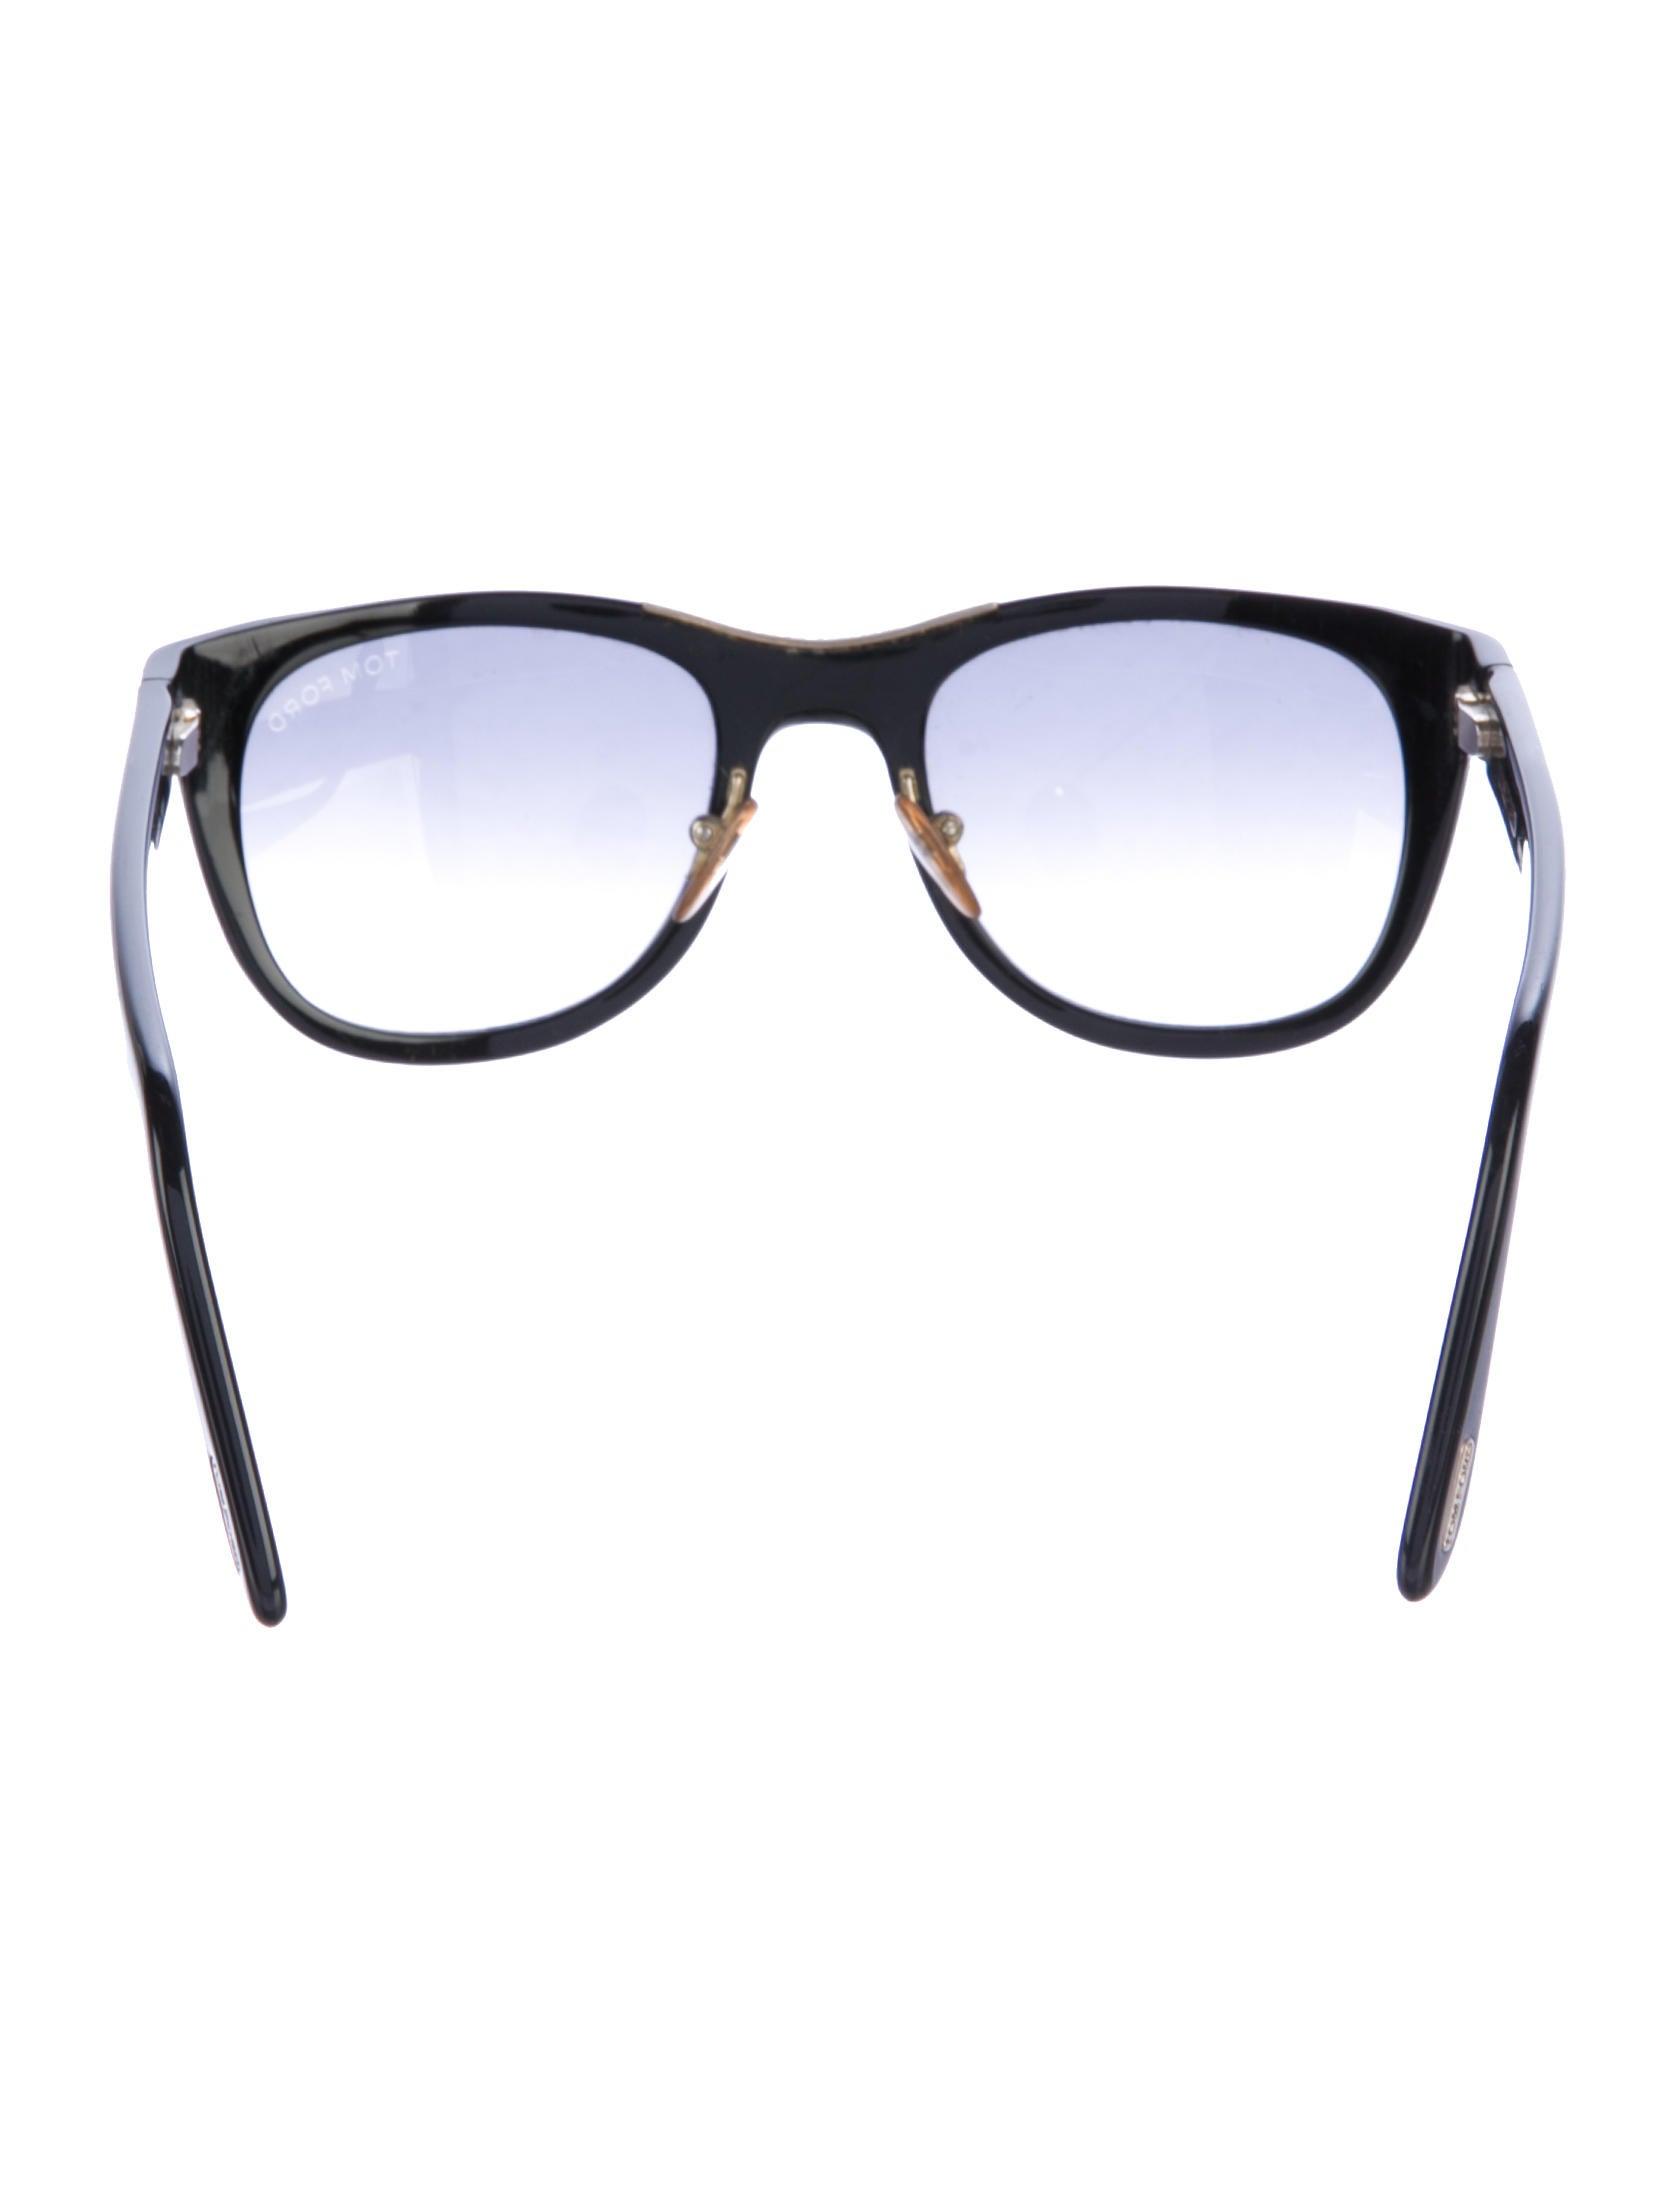 5326599f6e5 Tom Ford Eyewear Jack Resin Wayfarer